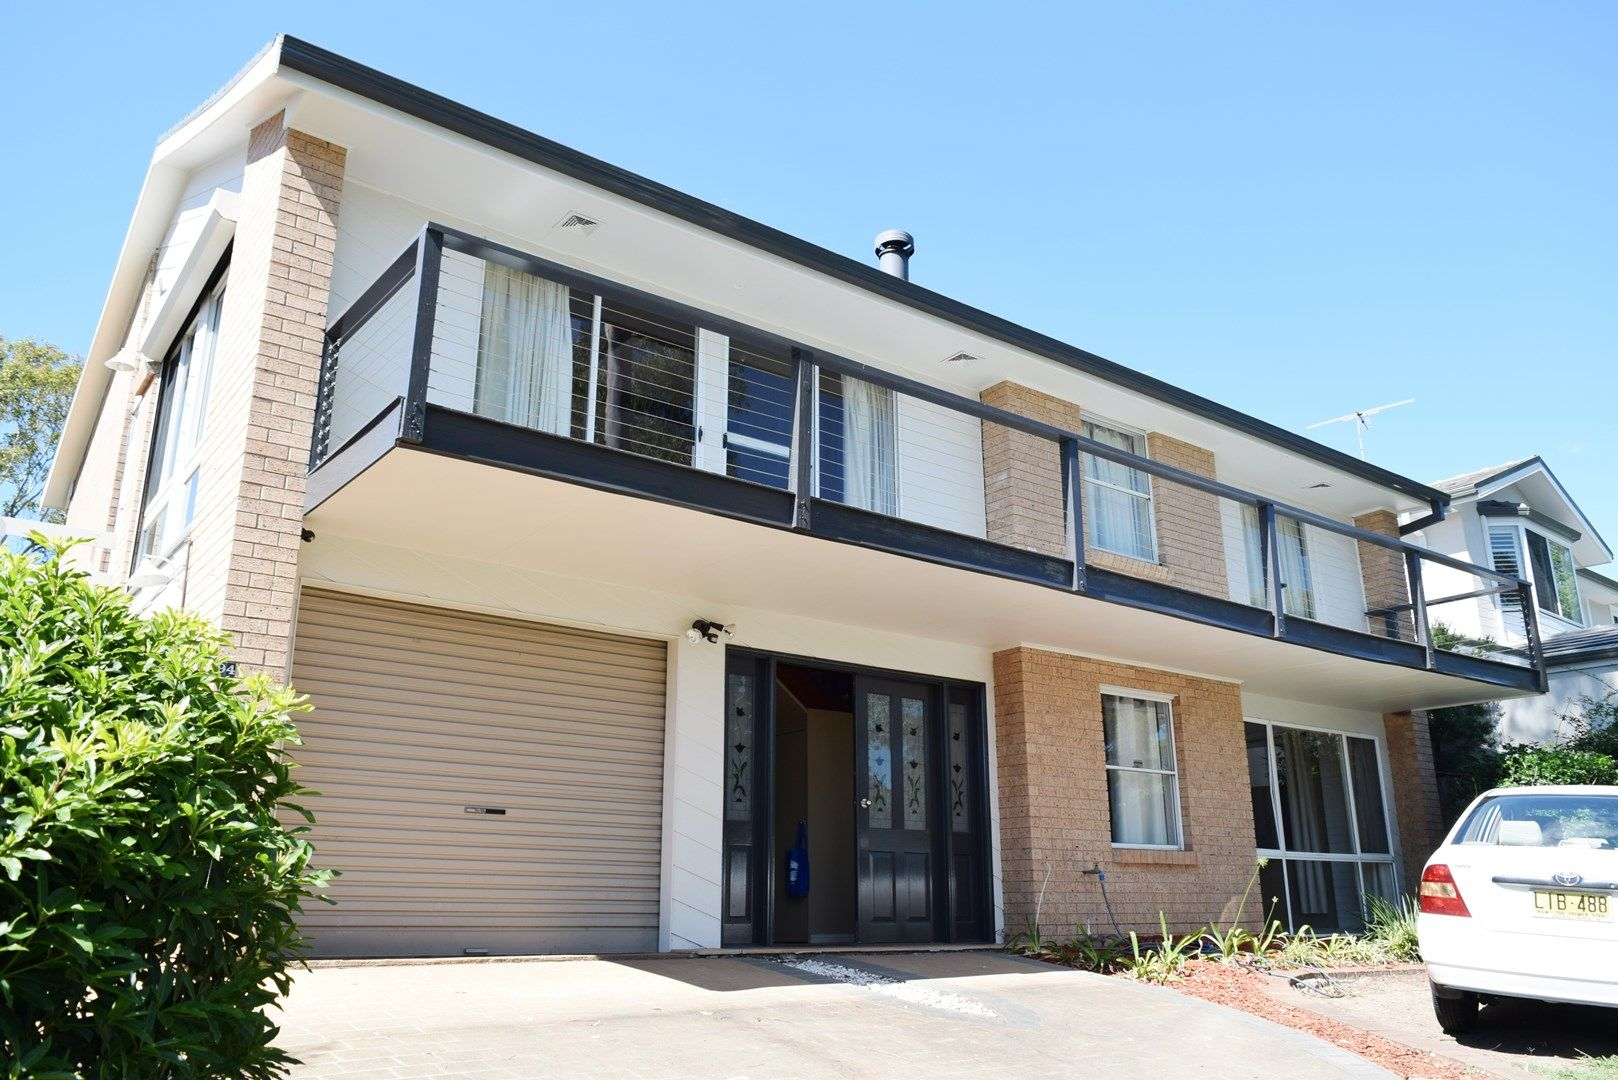 2/94 Cropley Drive, Baulkham Hills NSW 2153, Image 0